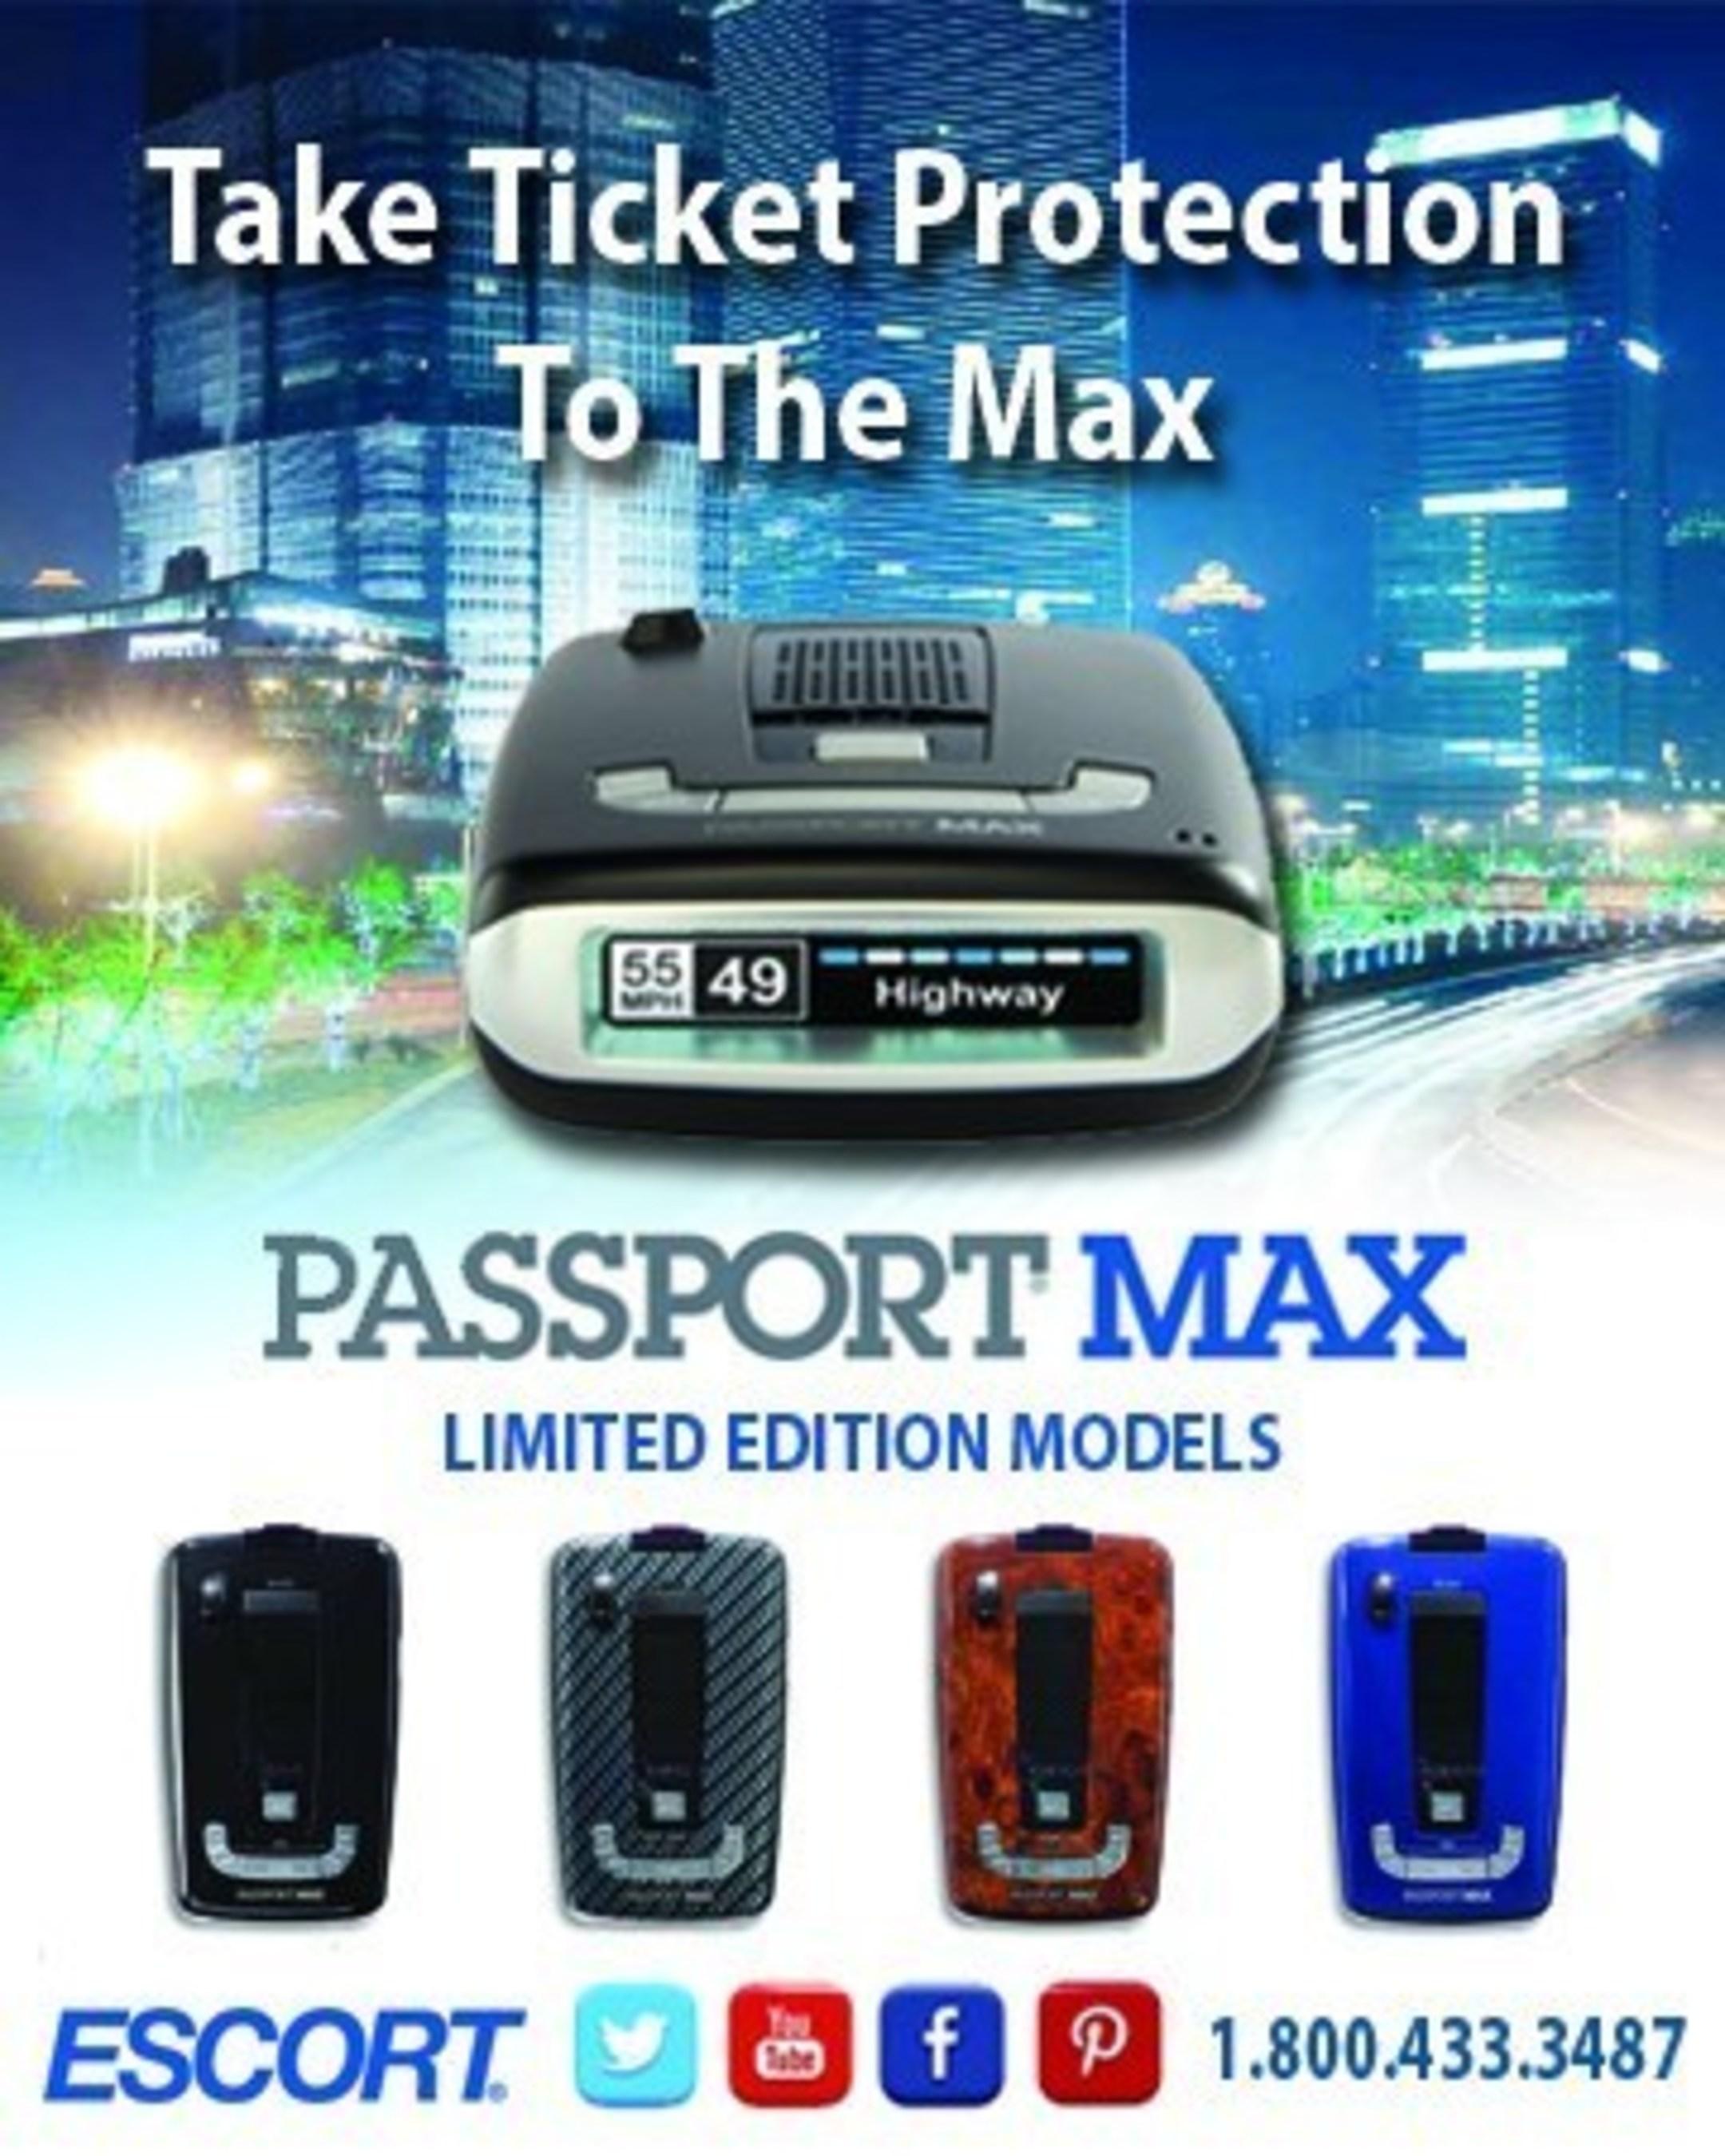 ESCORT displays Passport Max all-digital detector at Seattle Engadget Show (PRNewsFoto/ESCORT Inc.)